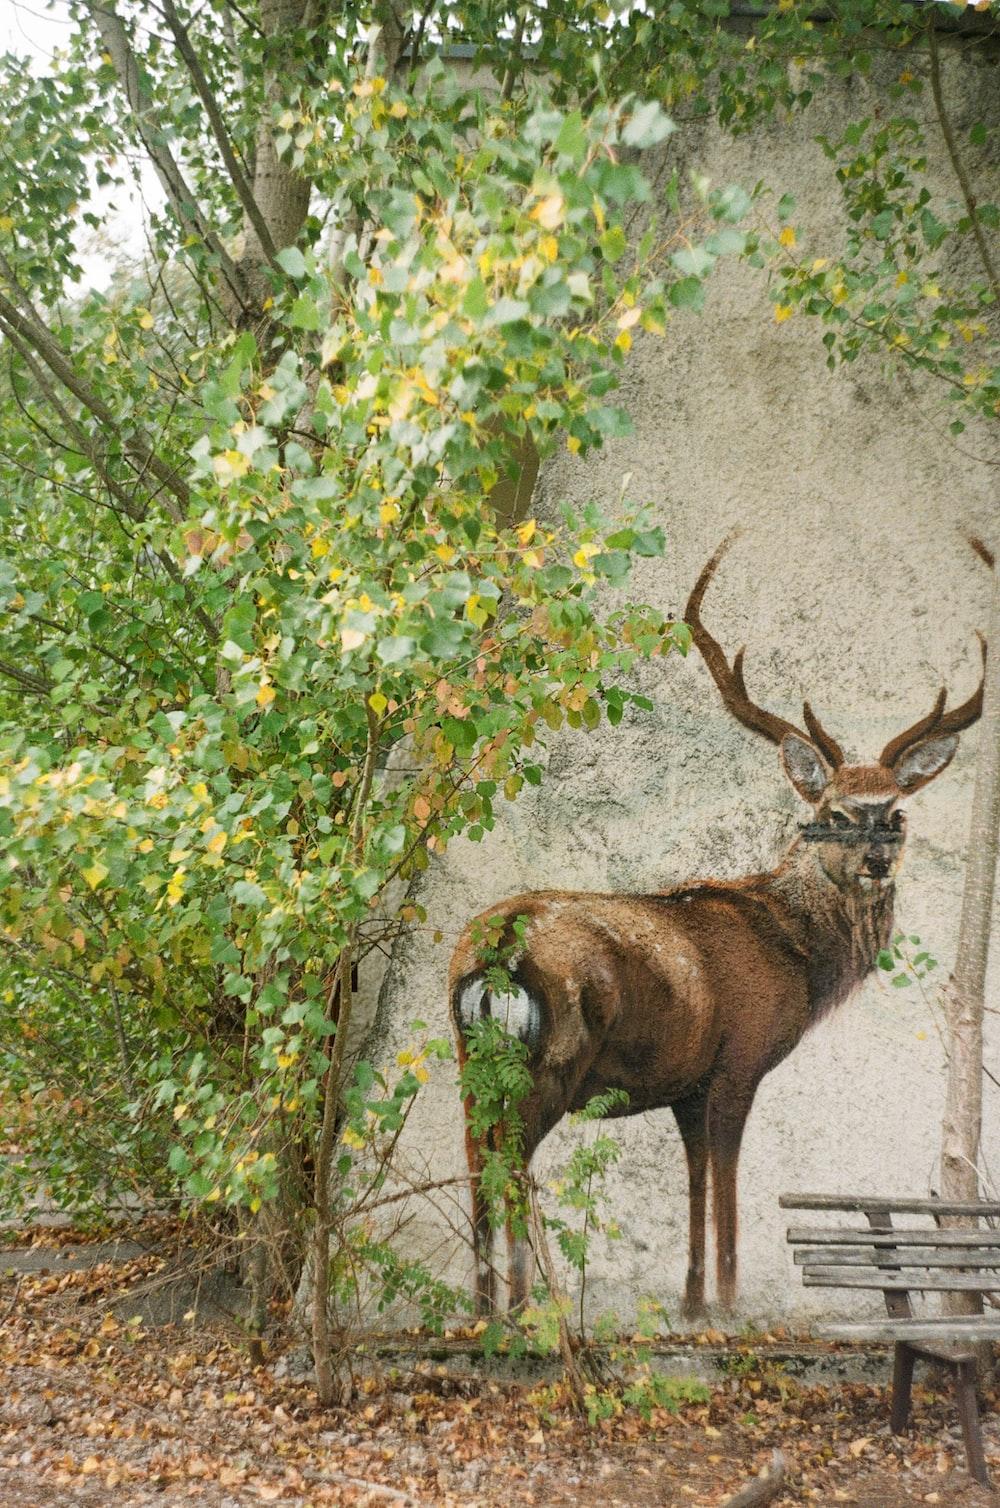 brown deer standing on gray concrete floor during daytime